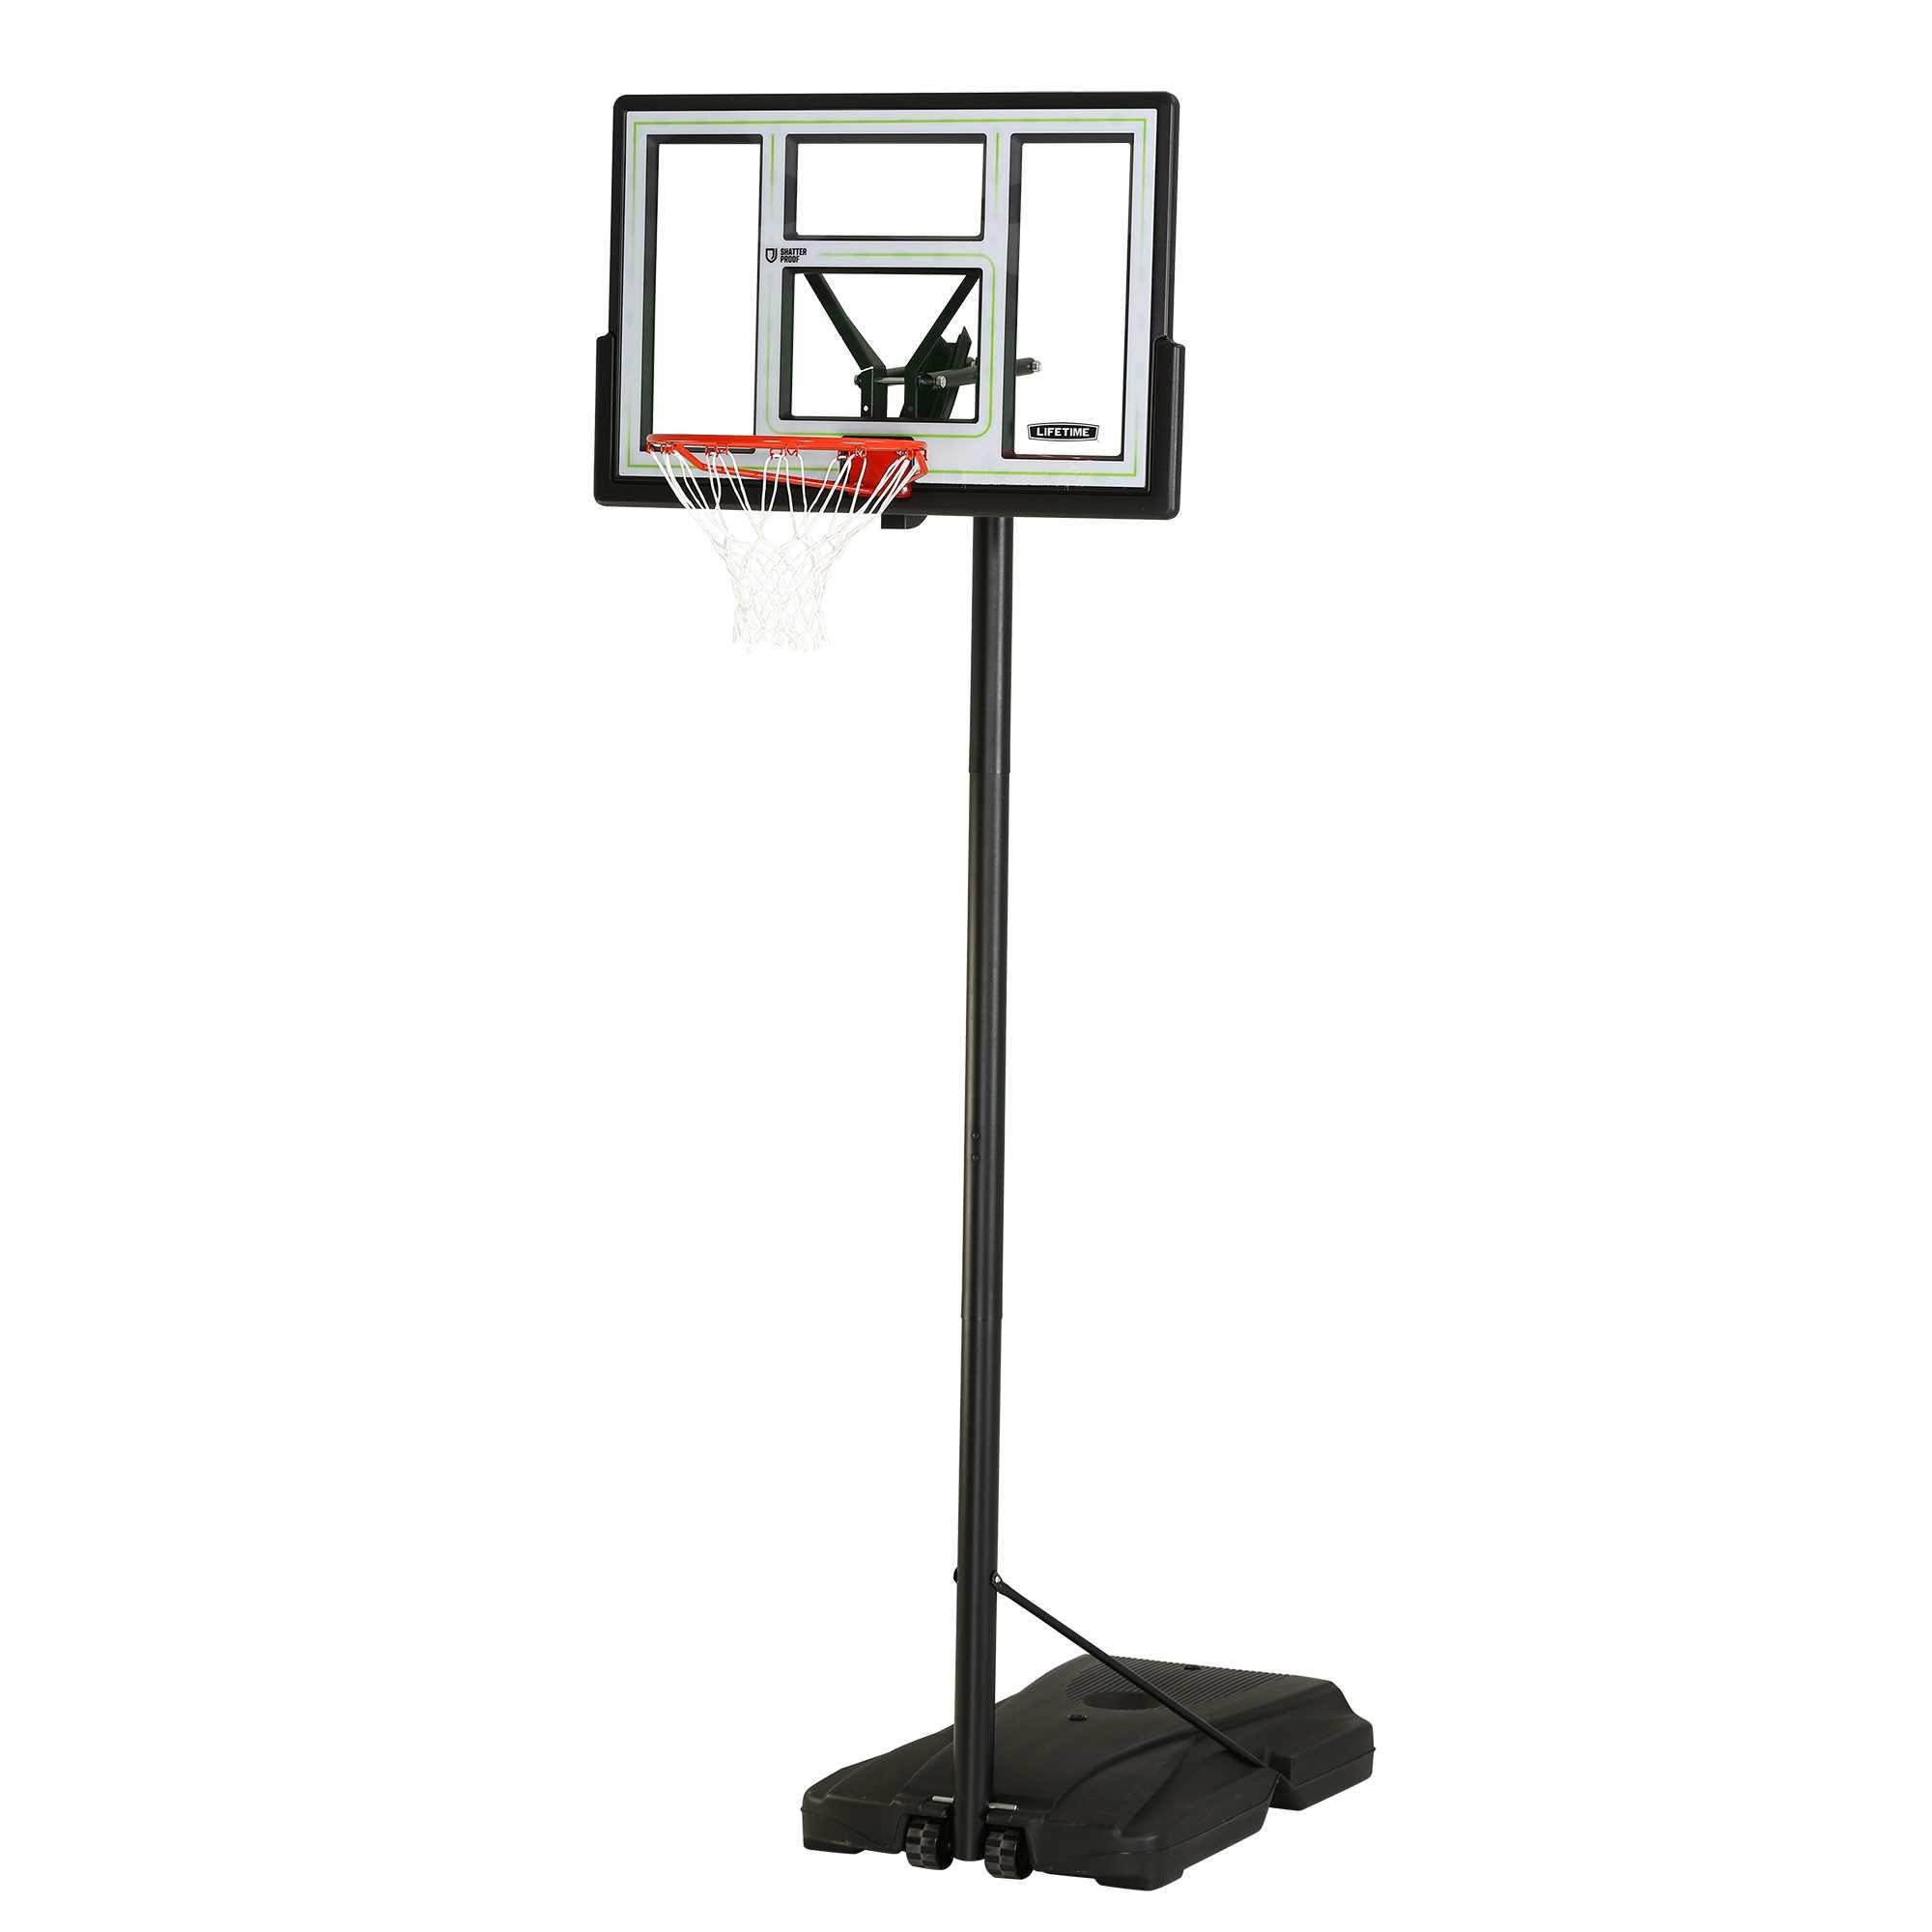 "Lifetime 46"" Adjustable Portable Basketball Hoop"